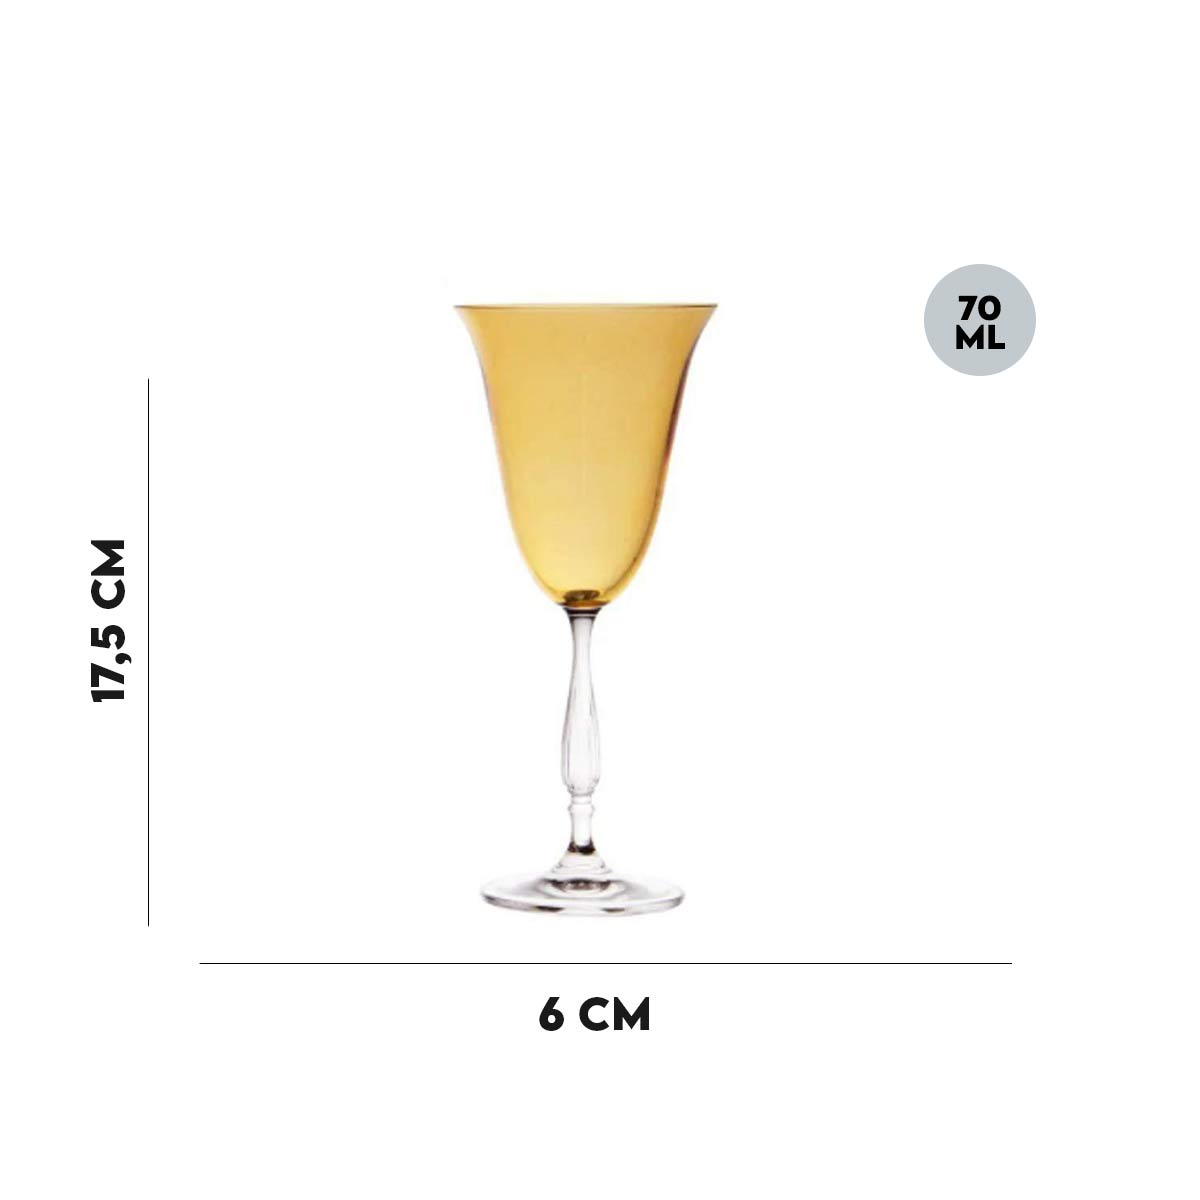 Taça Fregata Ambar Lyor 70 ml  - Lemis